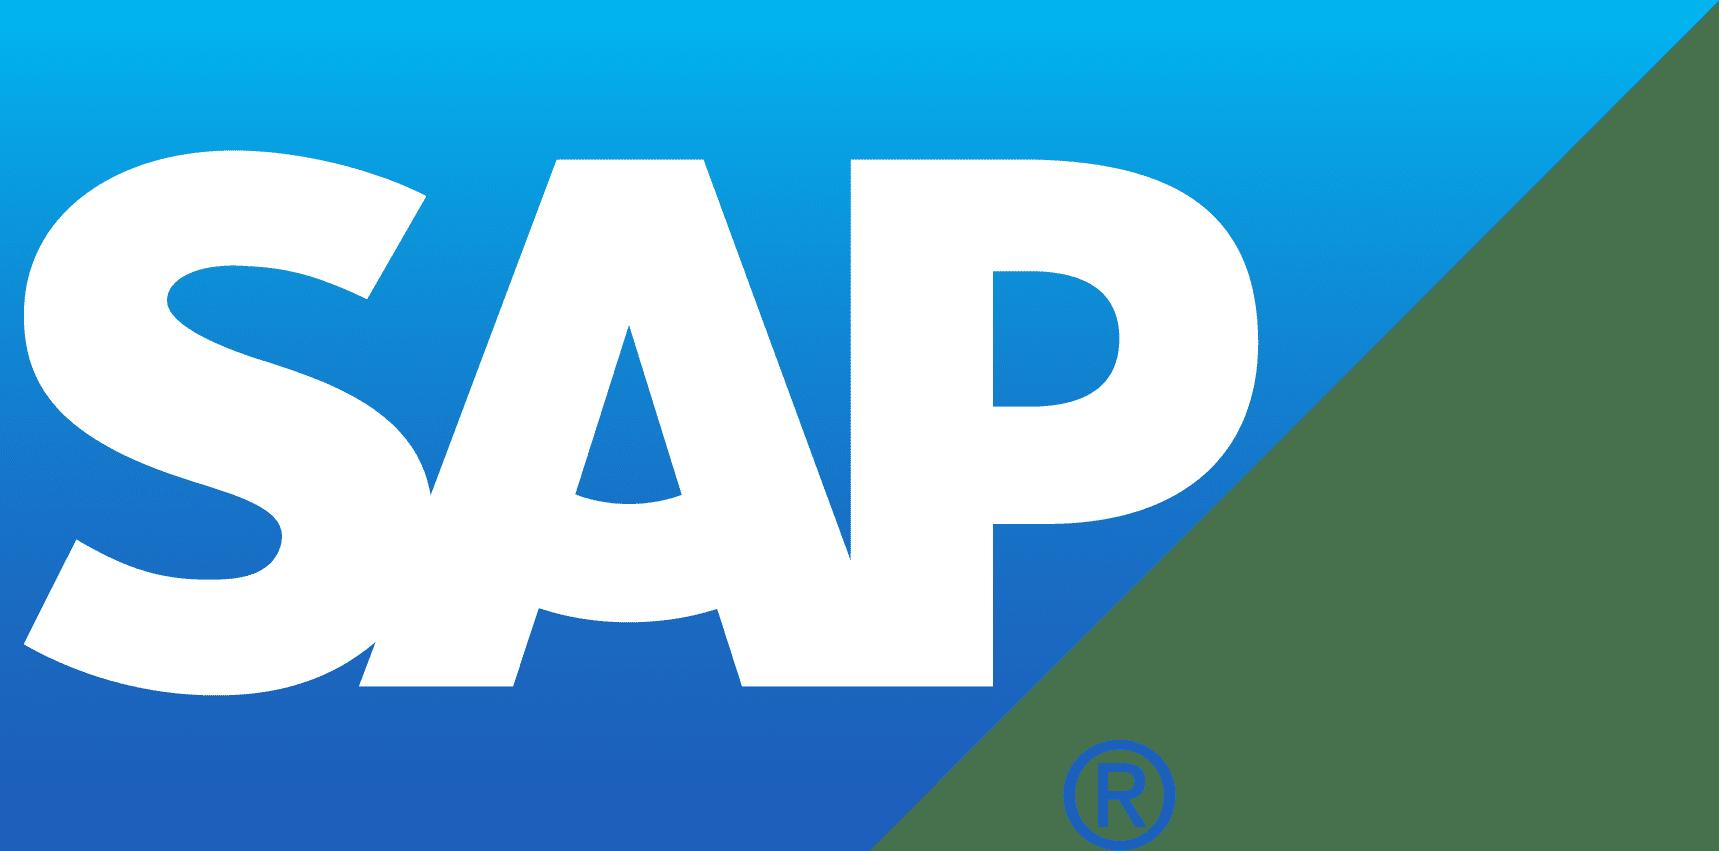 sap modernizes data warehousing with the launch of sap bw4hana dataversity